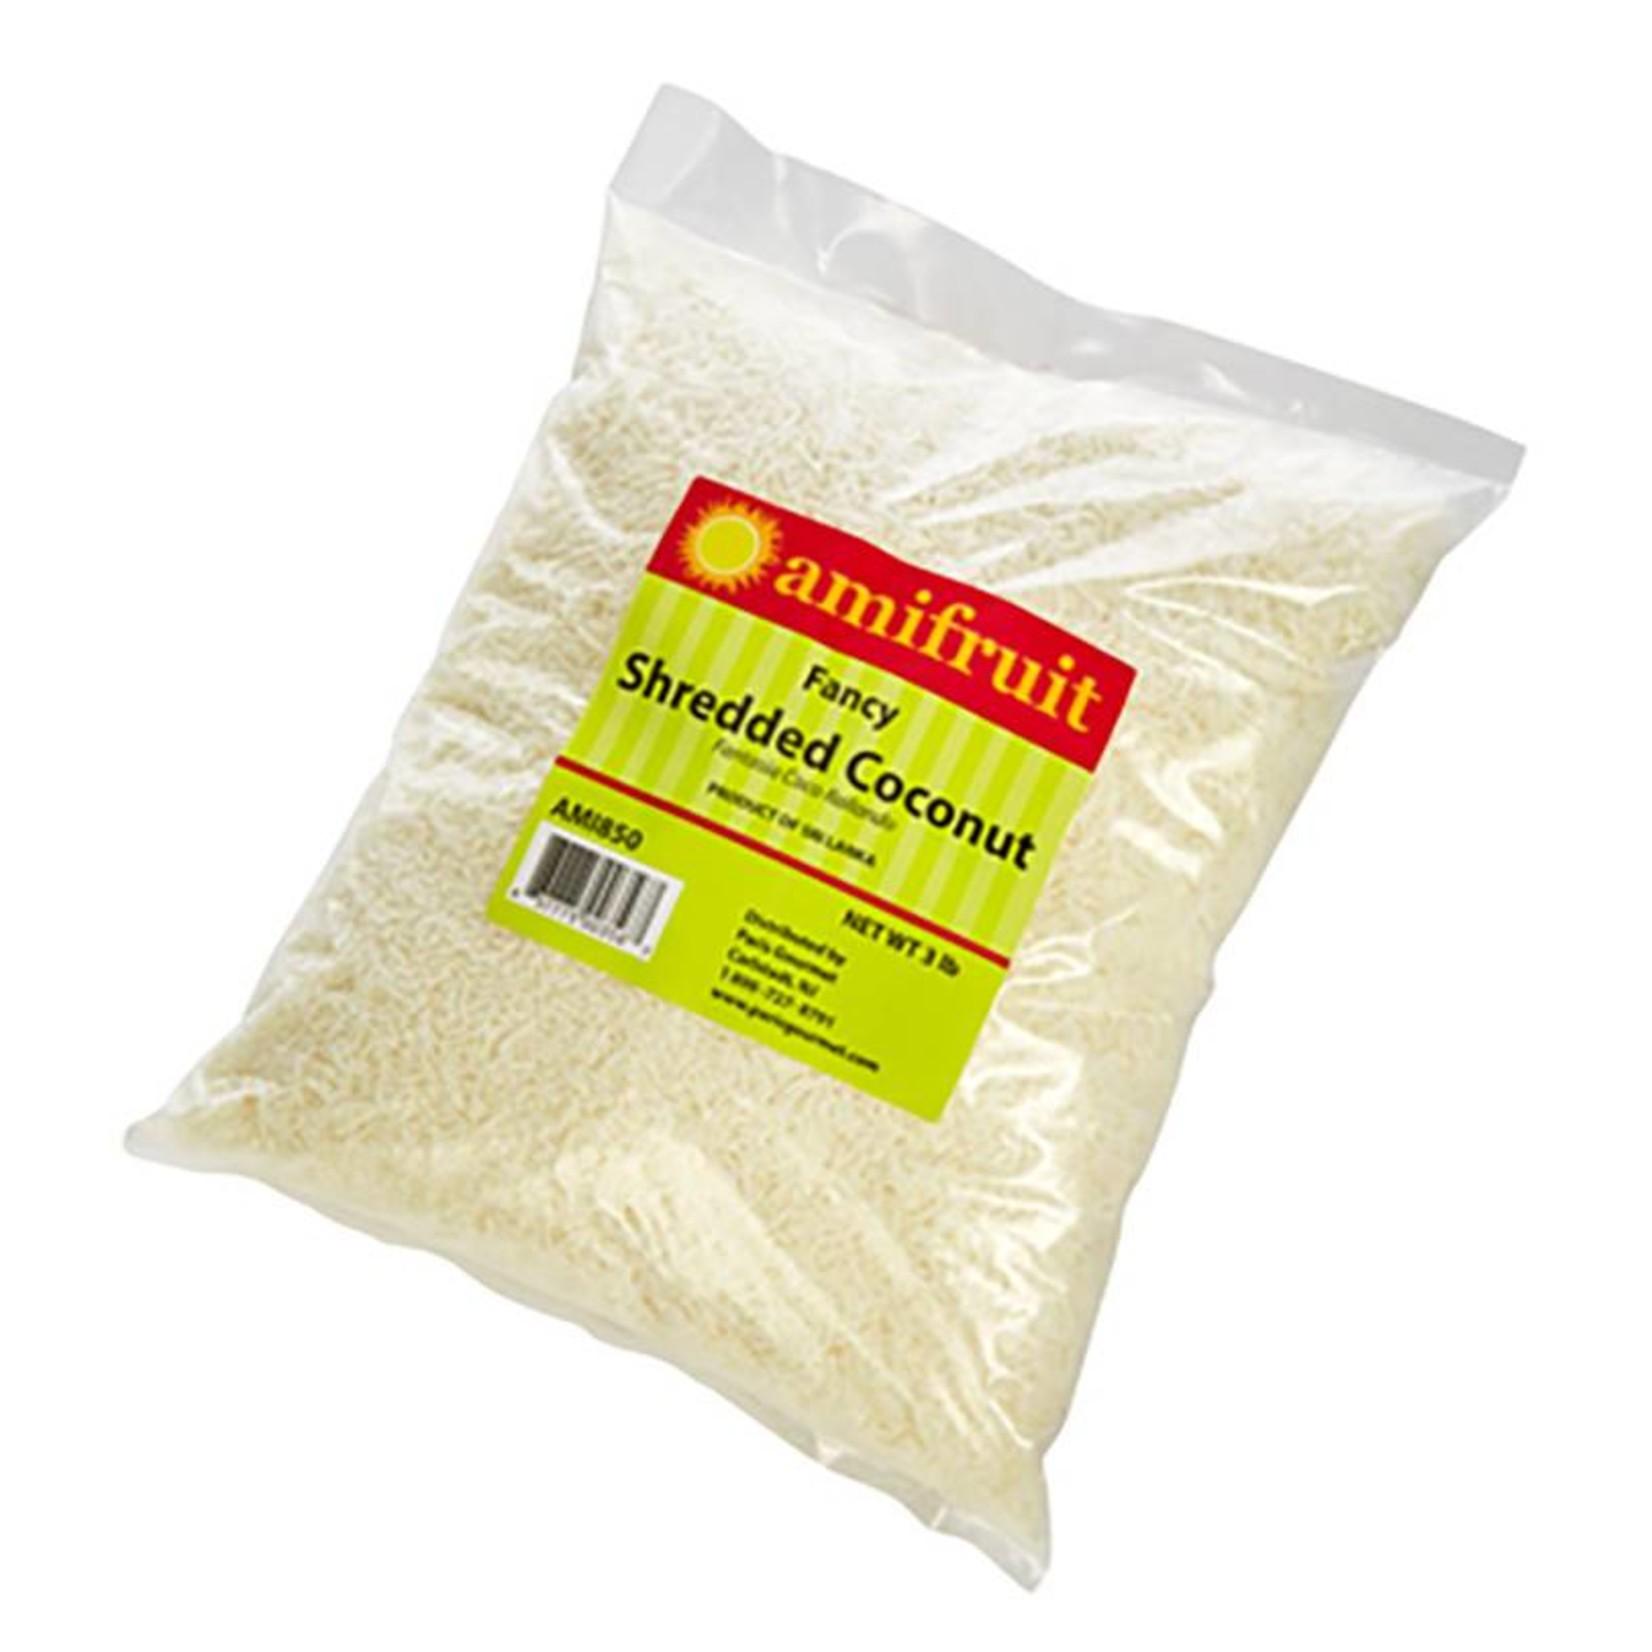 Amifruit Amifruit - Coconut fancy shredded, unsweet - 3lb, AMI850